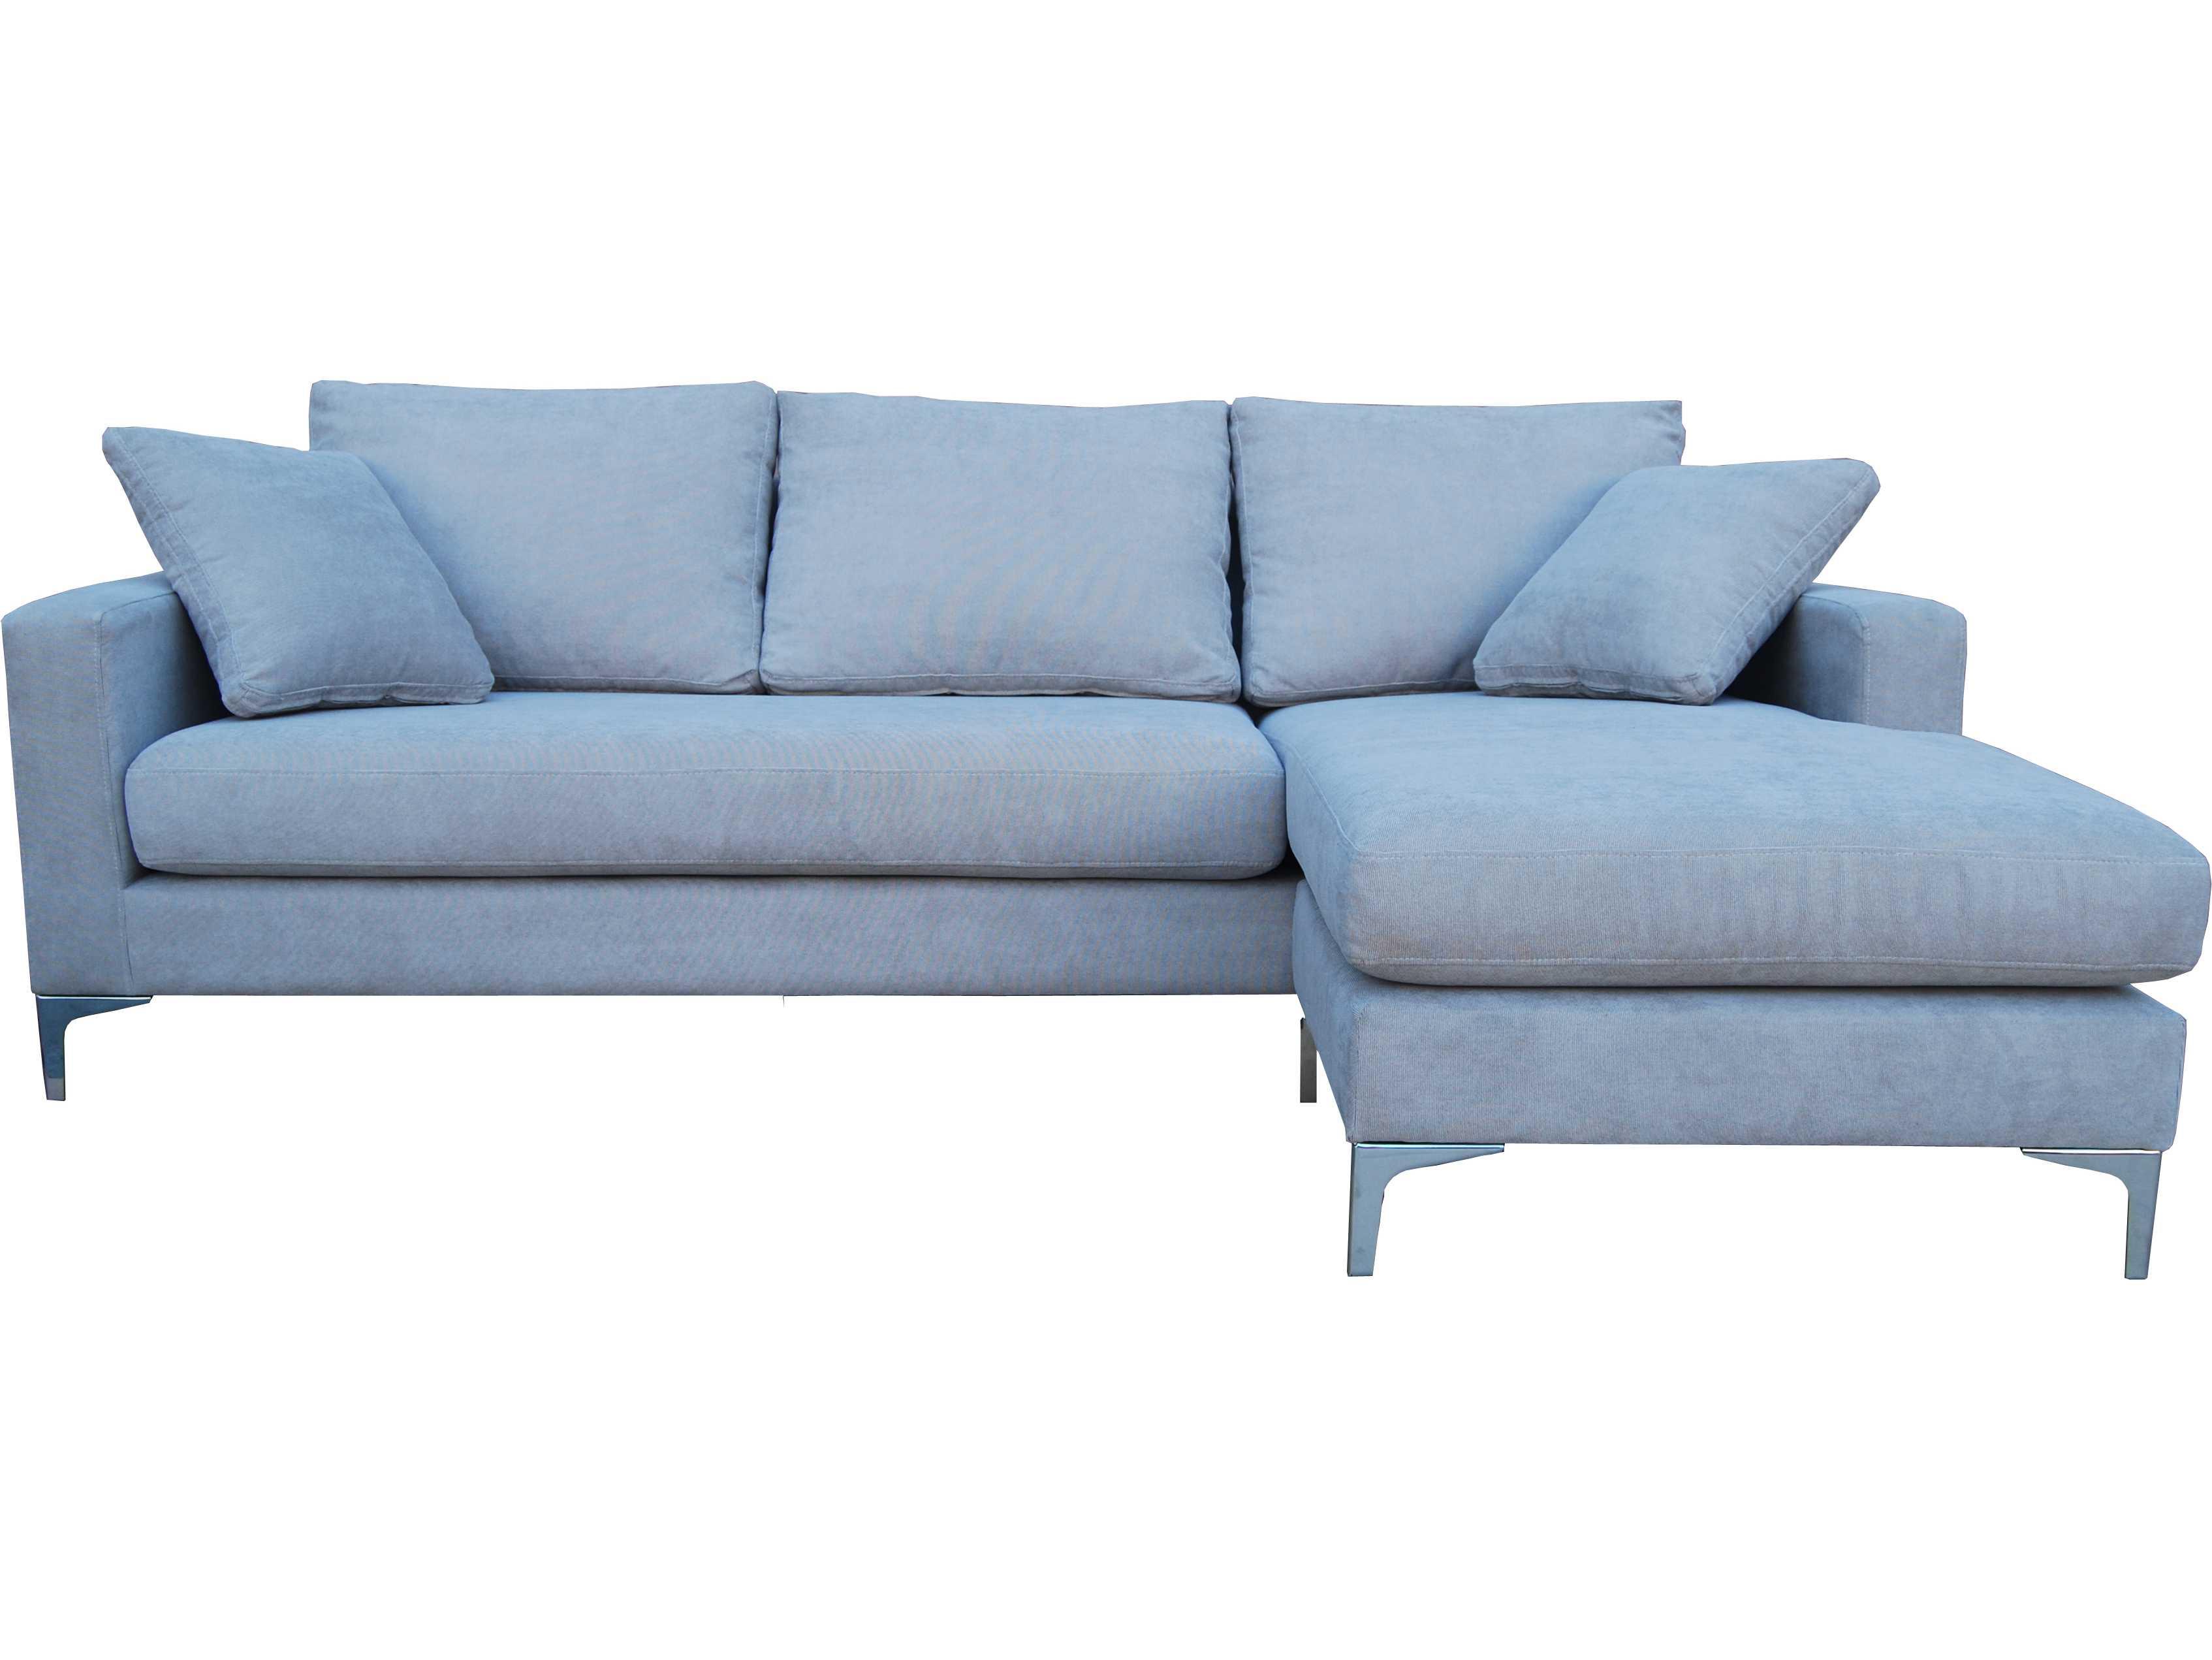 Mobital swap dark grey tweed secional sofa for Grey tweed couch